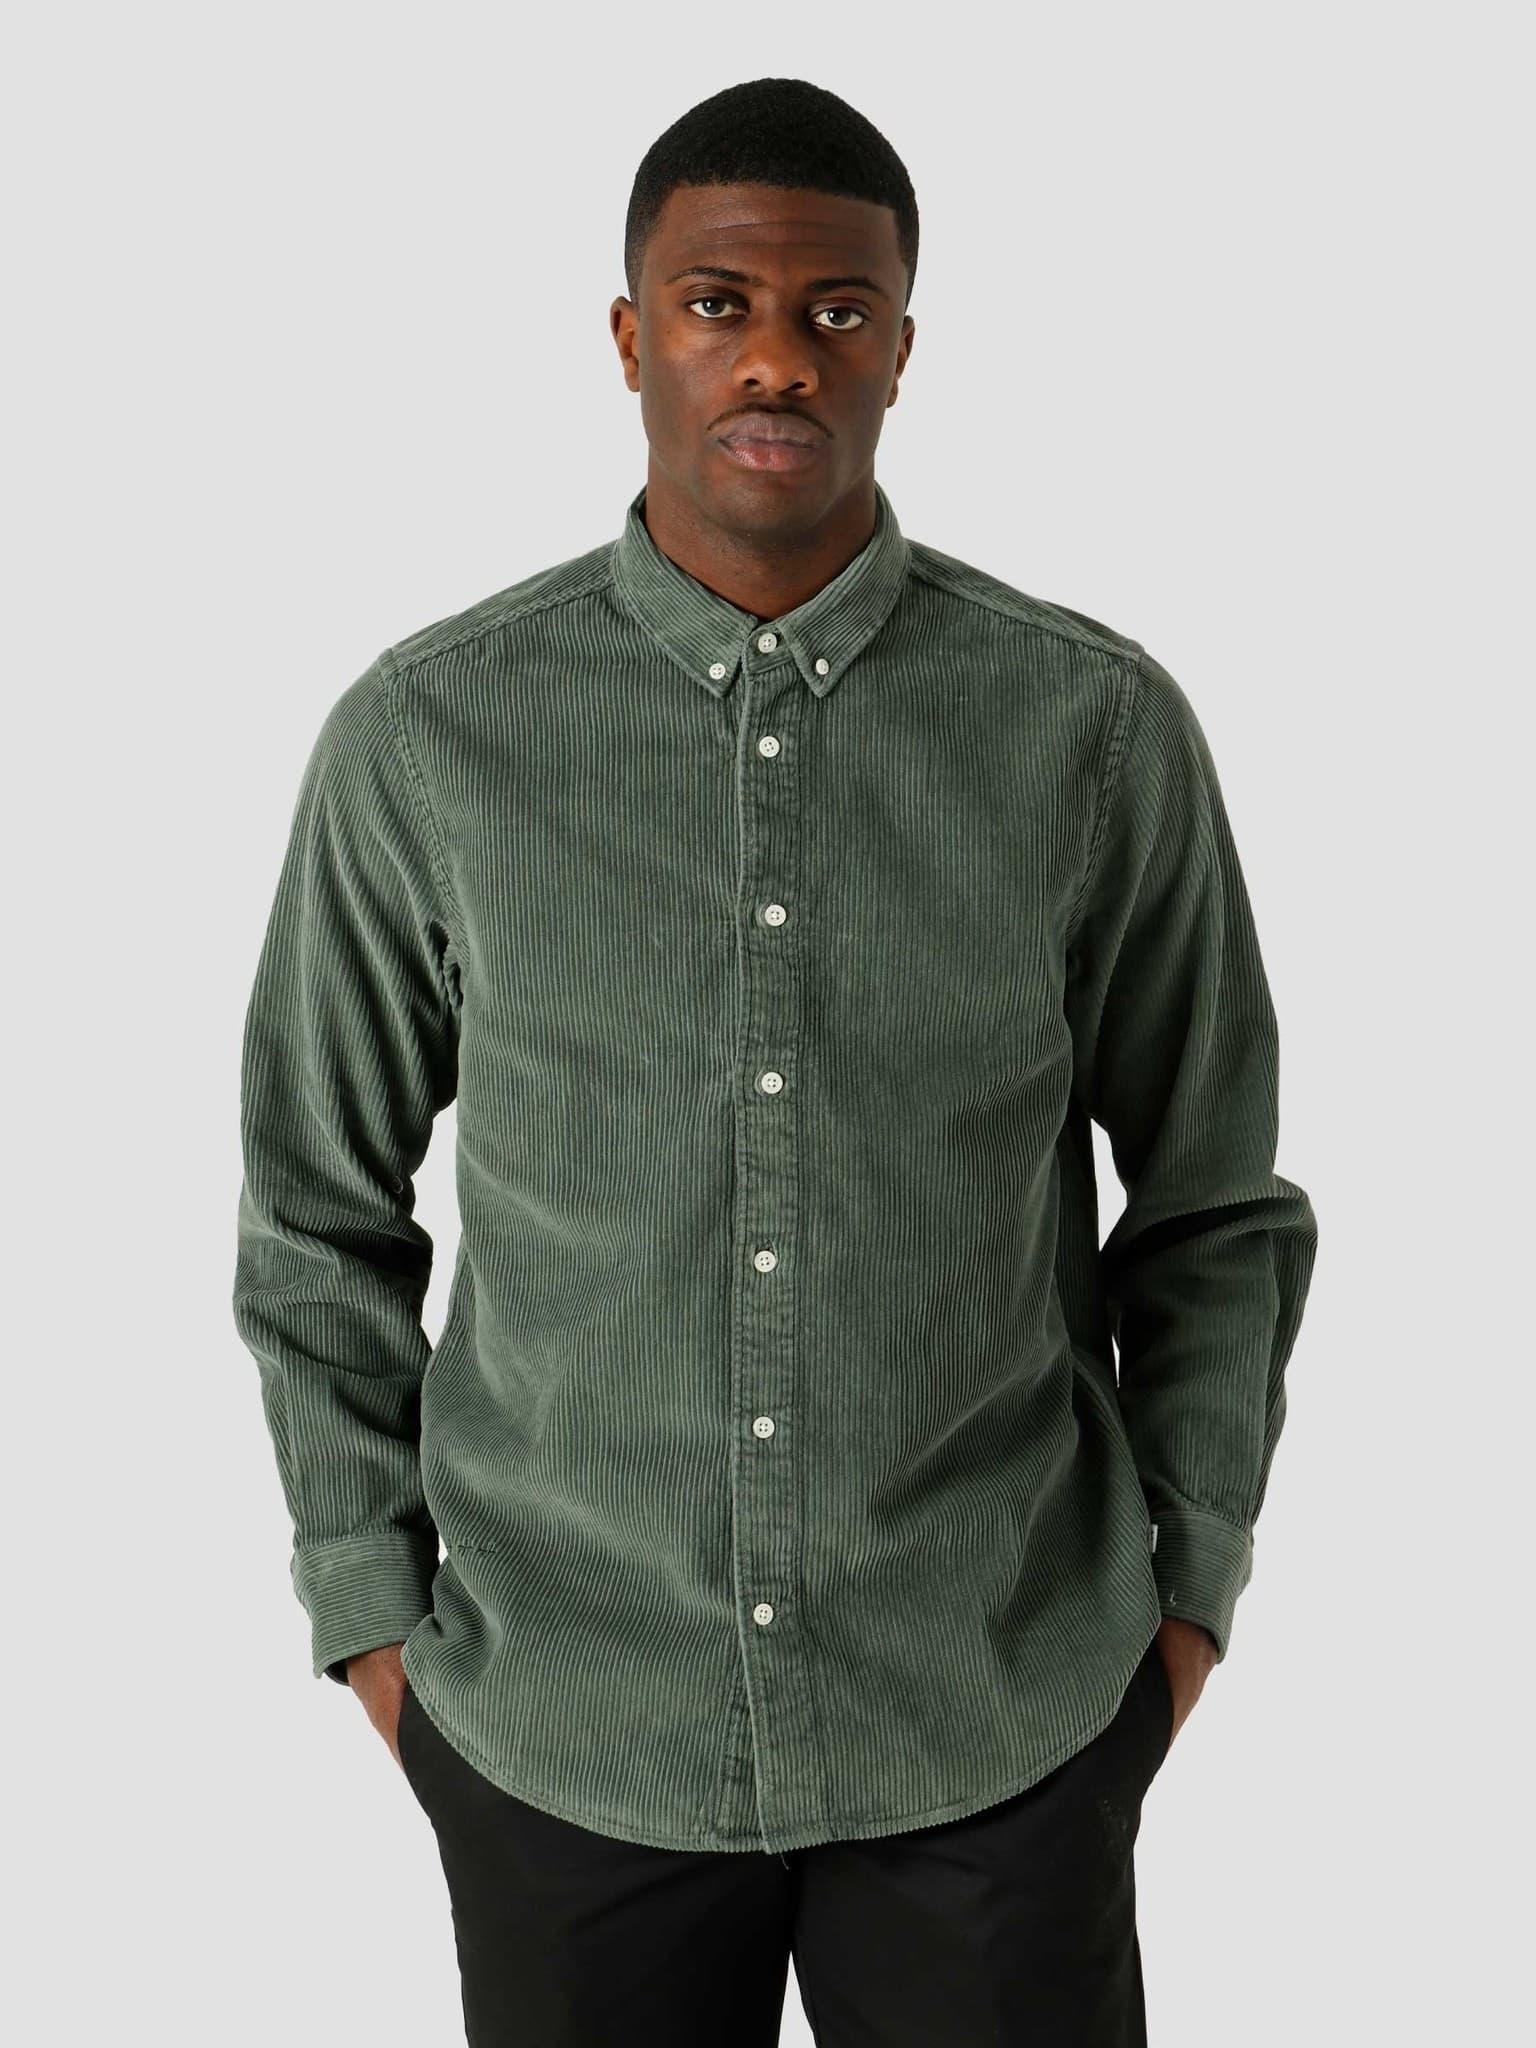 QB41 Cord Shirt Olive Green